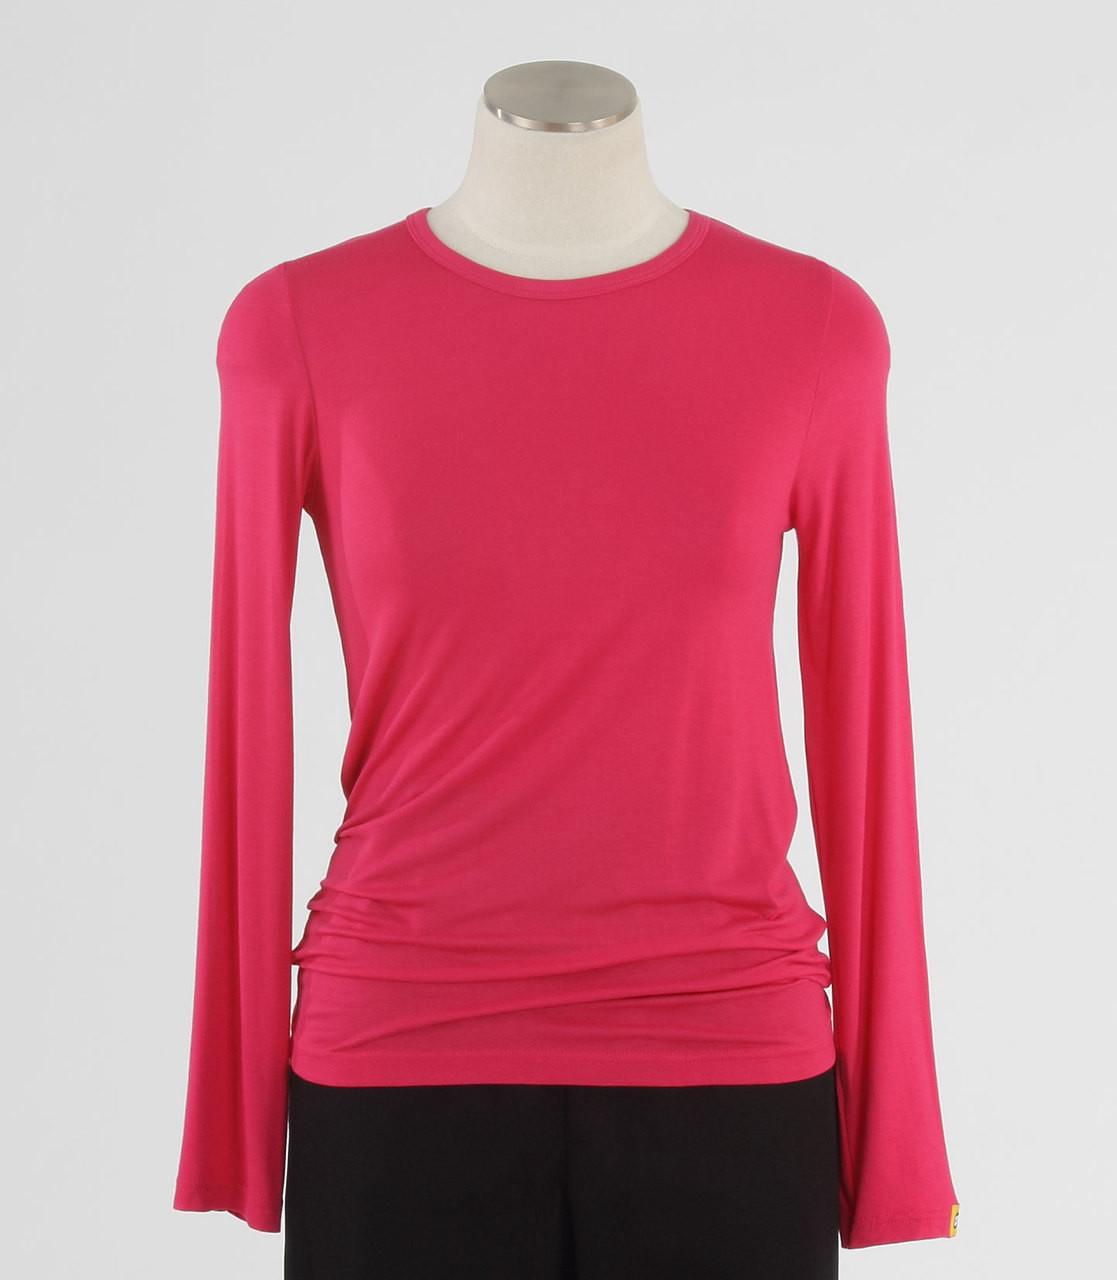 0a04d883d4f WonderWink Womens Silky Long Sleeve Tee Hot Pink - Scrub Med